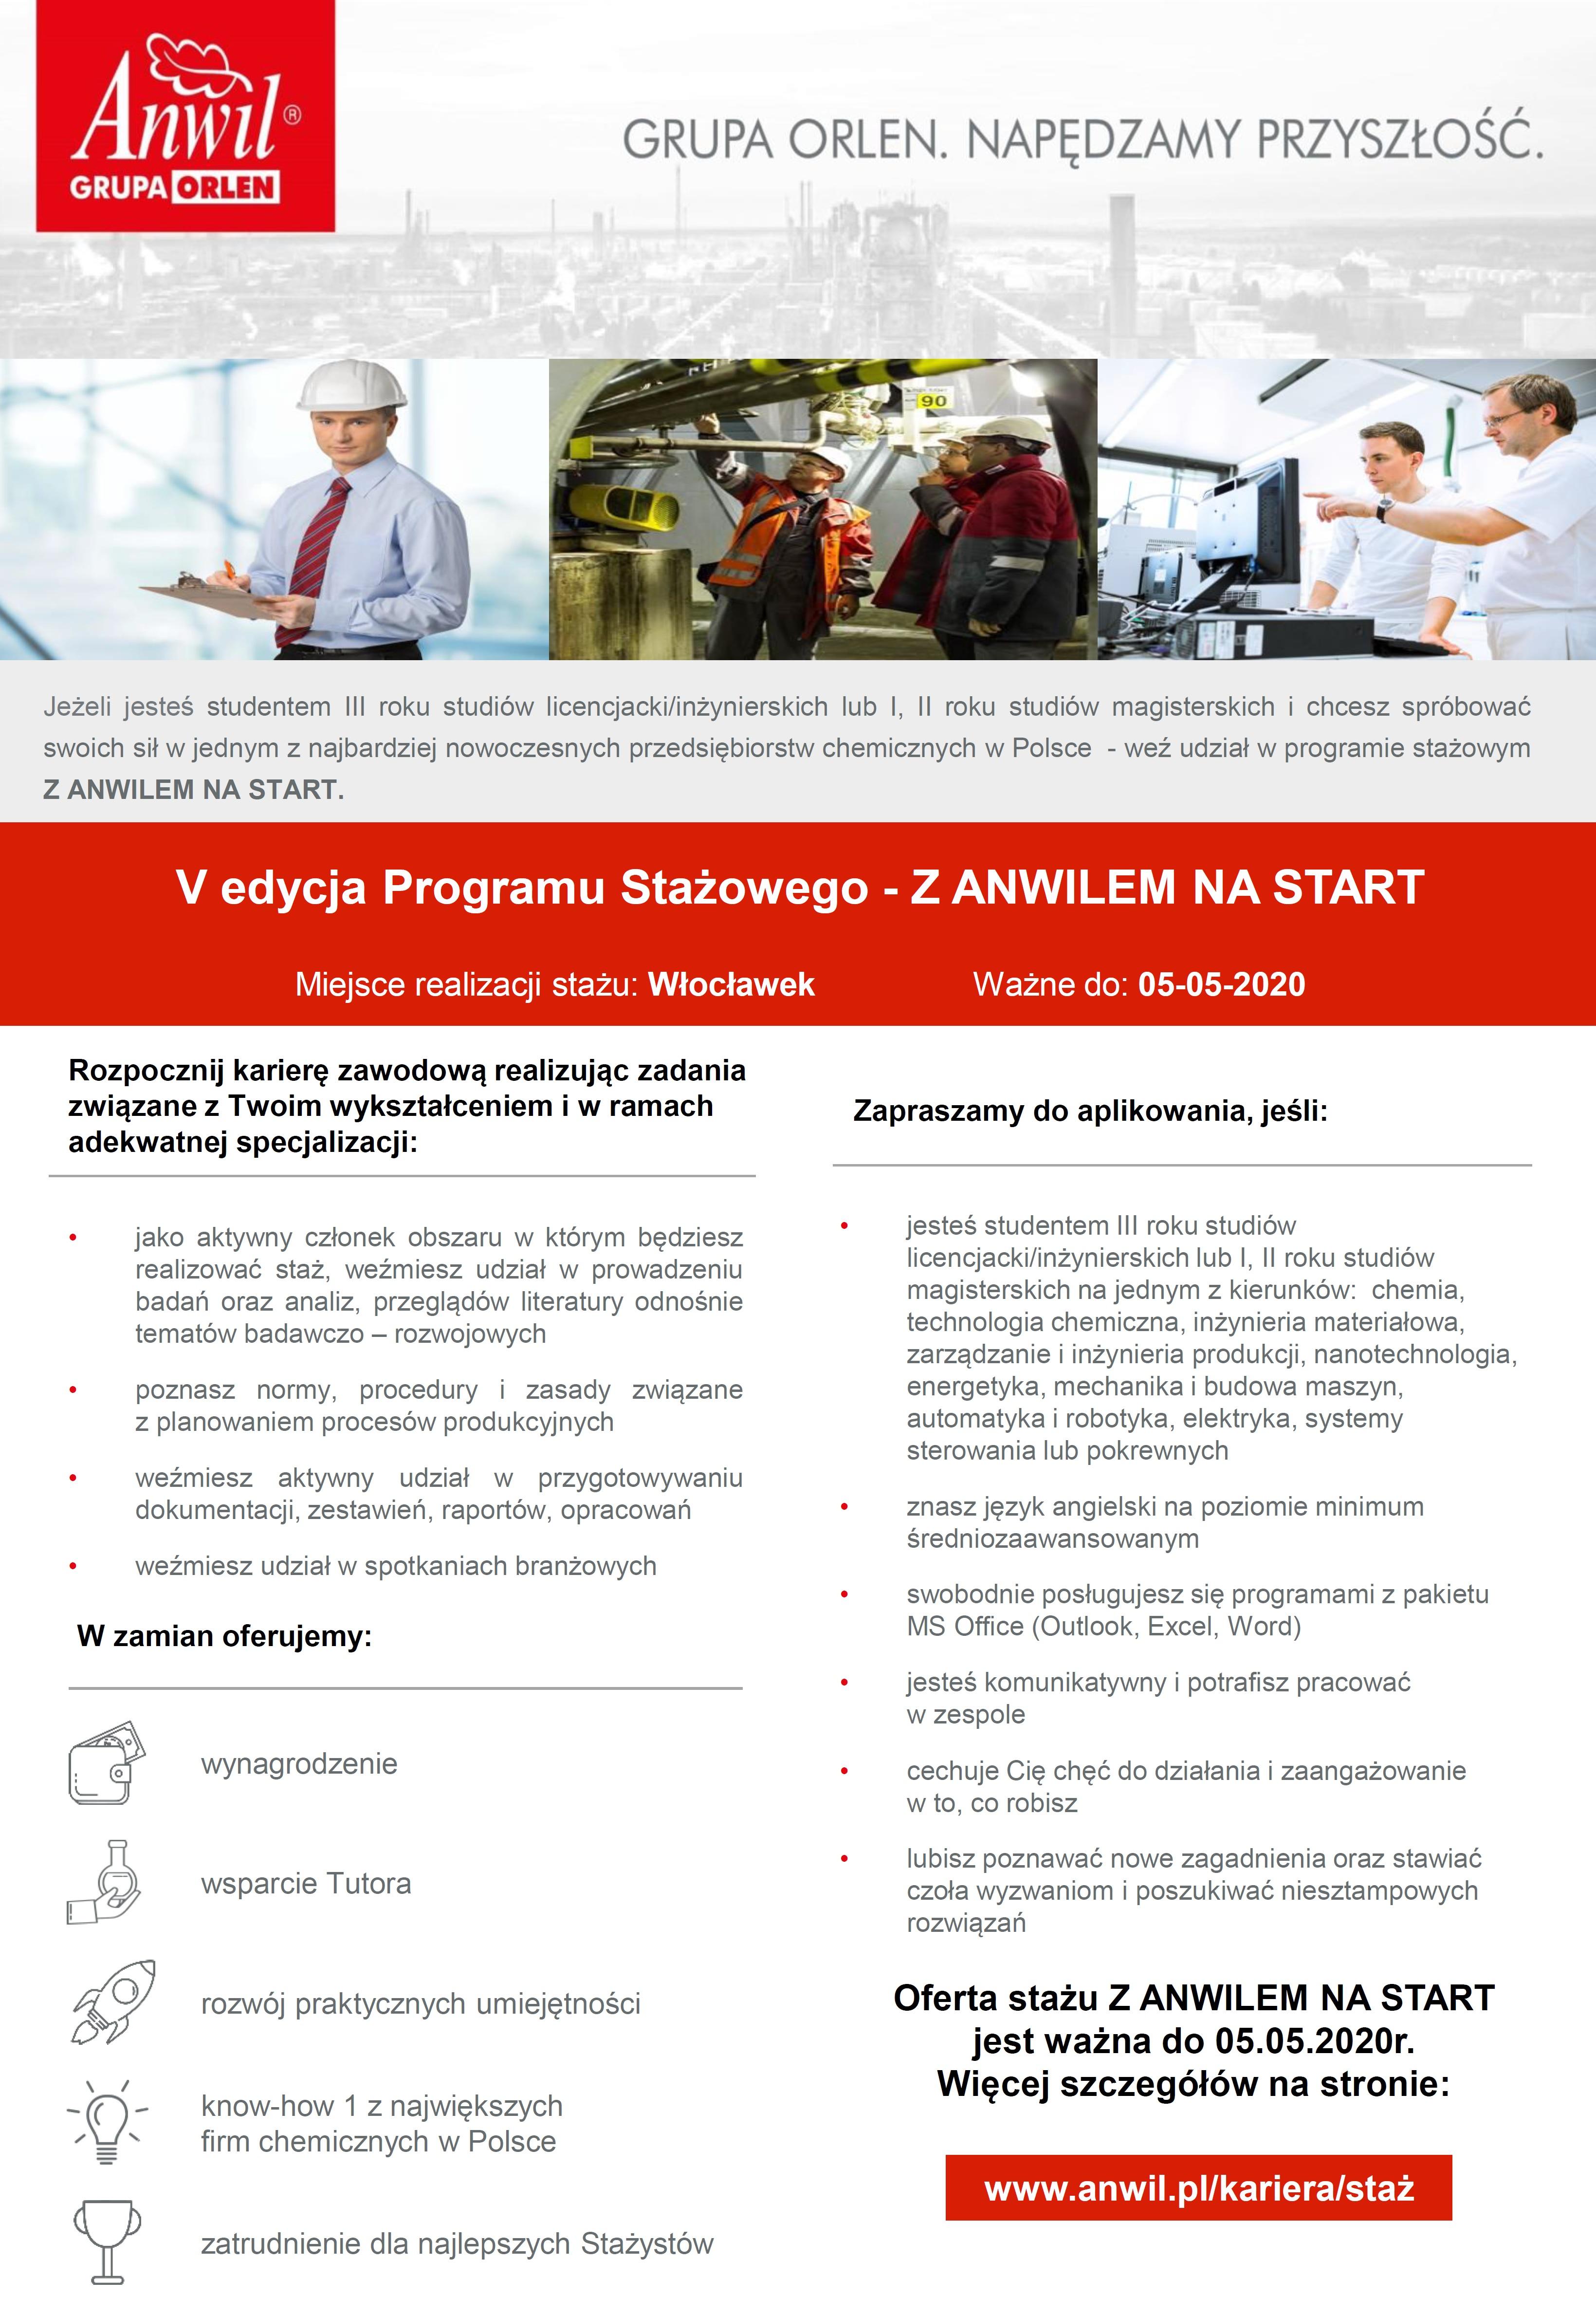 V edycja Programu Stażowego -  Z ANVILEM NA START